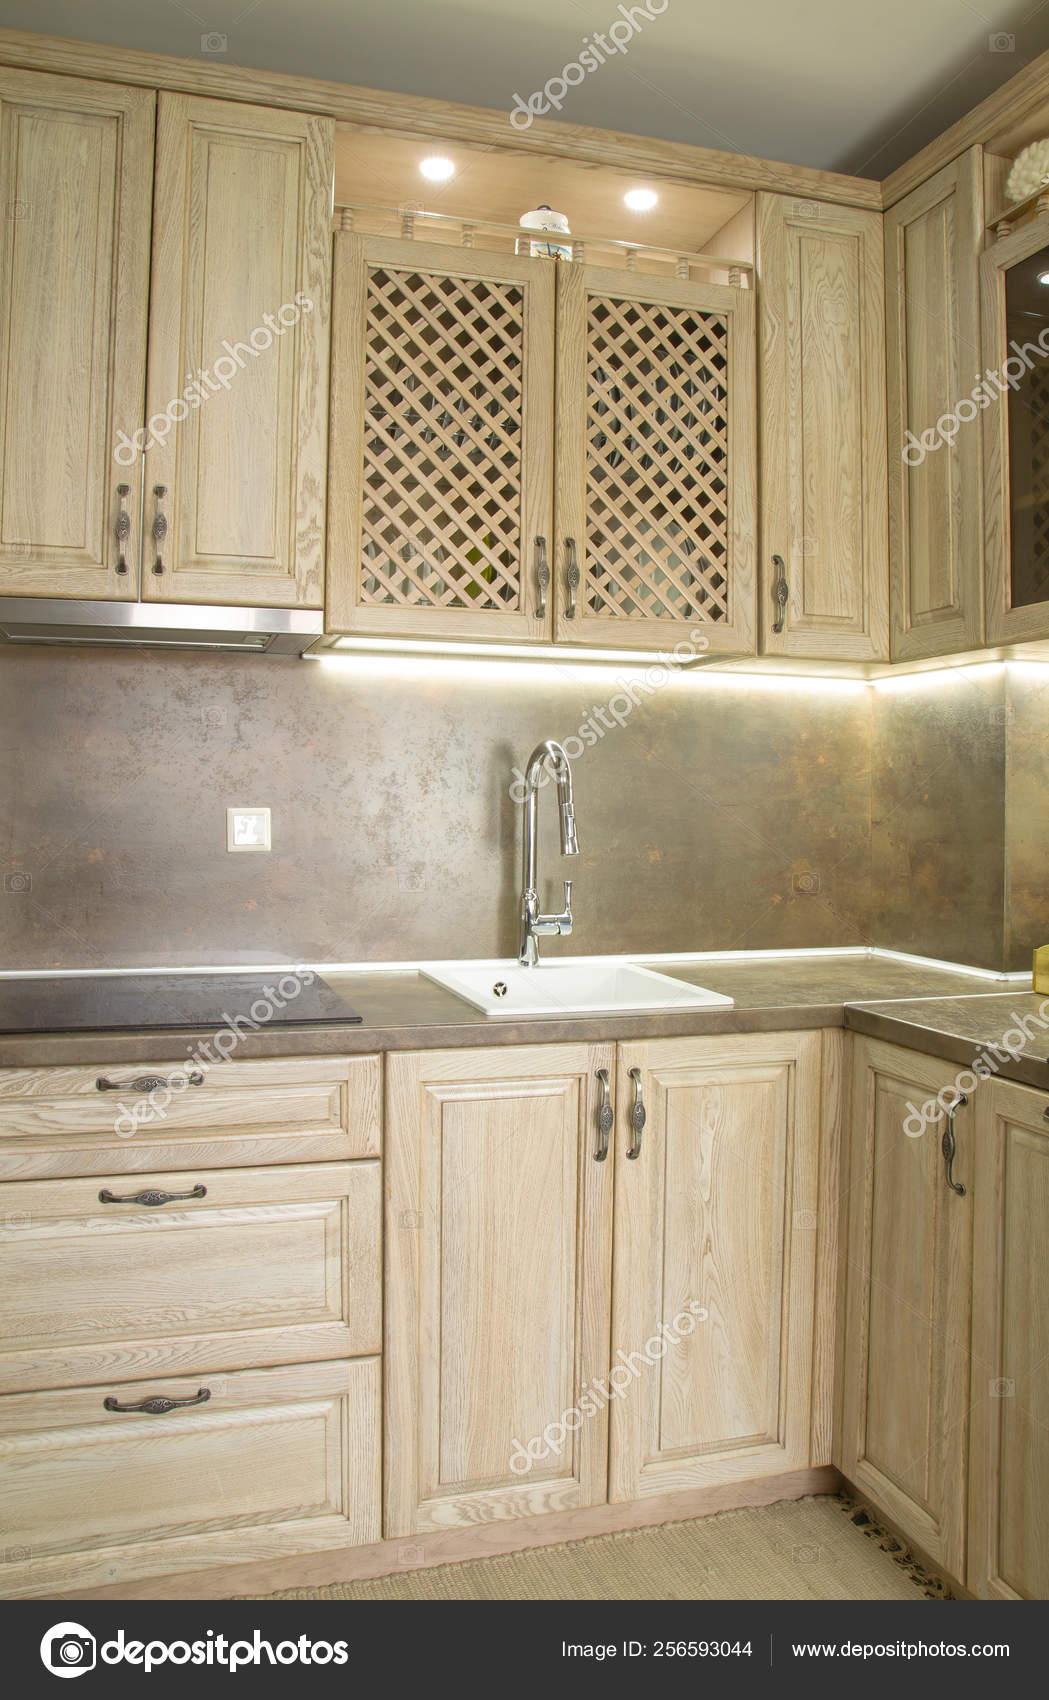 Vintage Style Kitchen Furniture Stock Photo C Kocetoilief 256593044